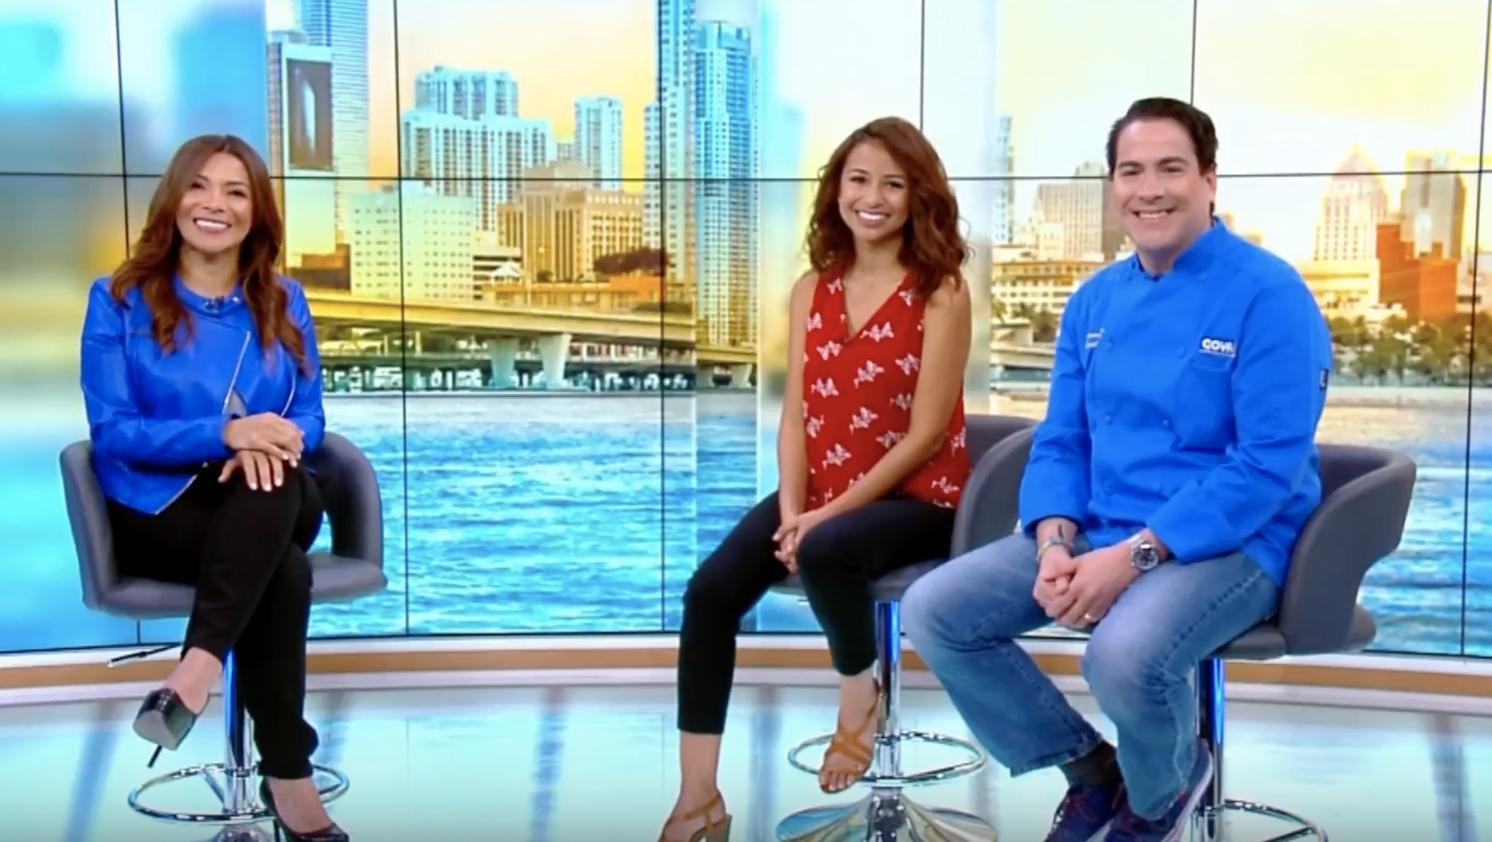 Univision - 2017 Desafio Goya Announcement